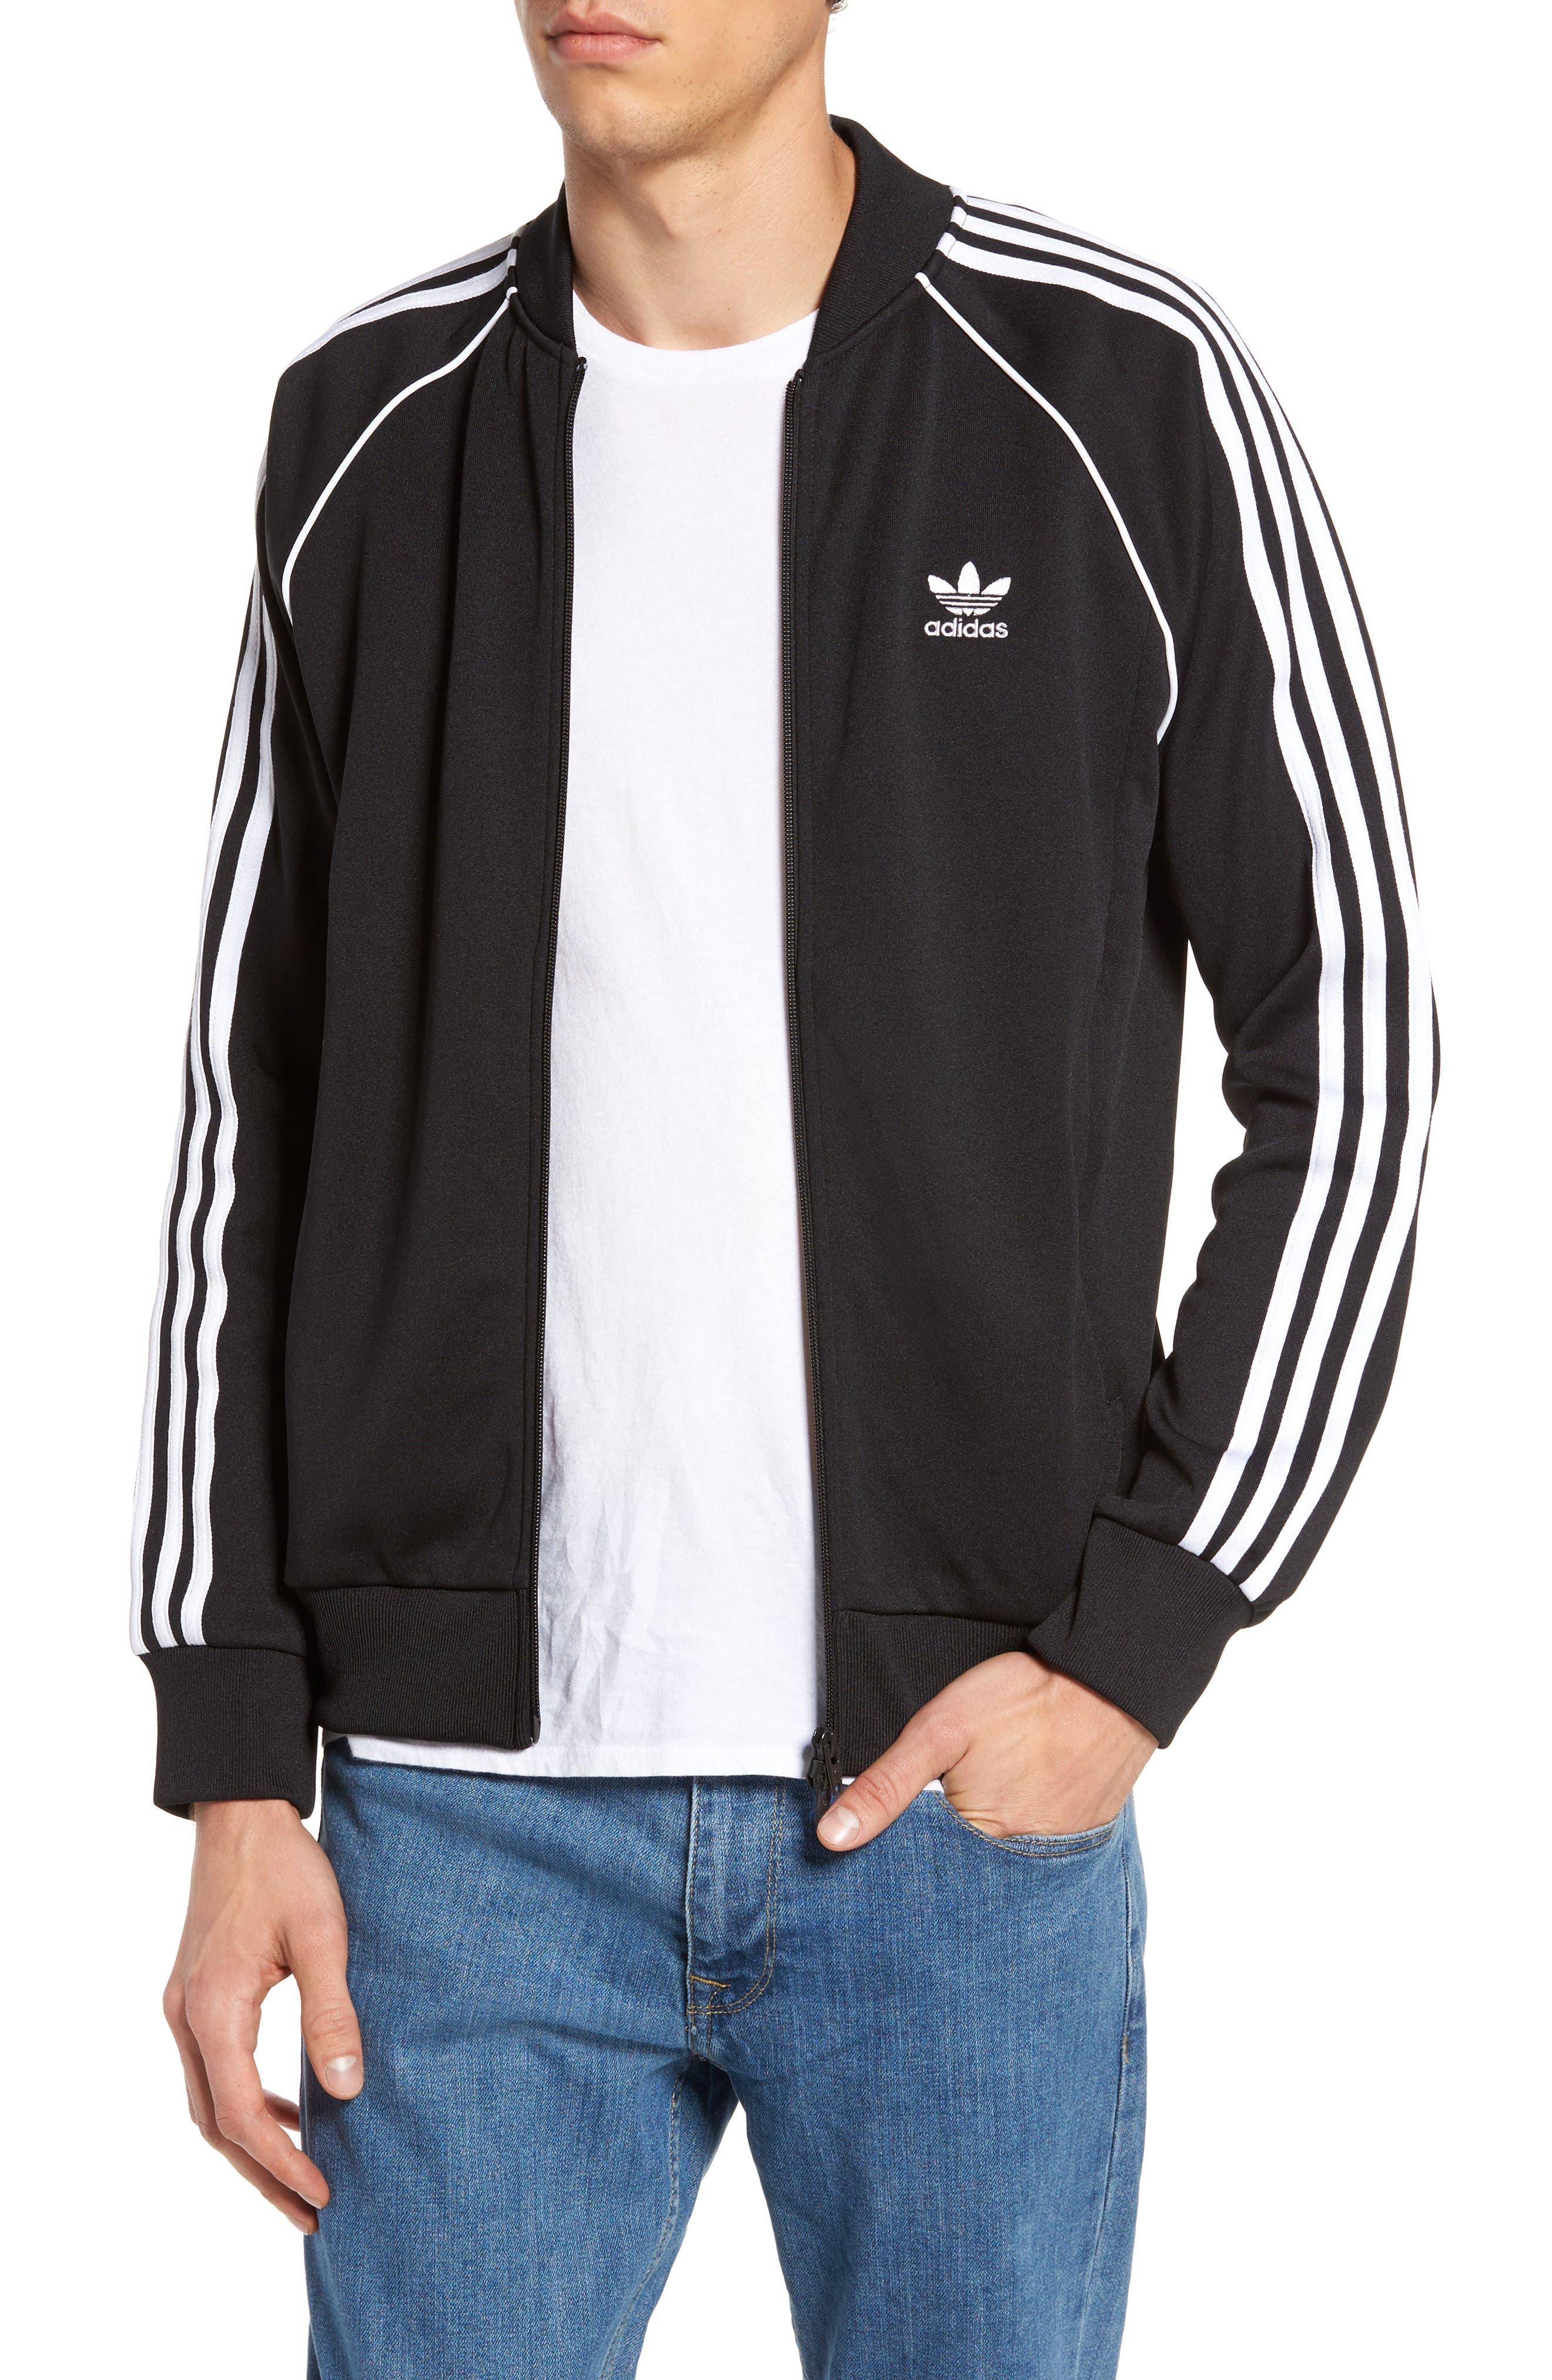 ADIDAS ORIGINALS, SST Track Jacket, Main thumbnail 1, color, BLACK